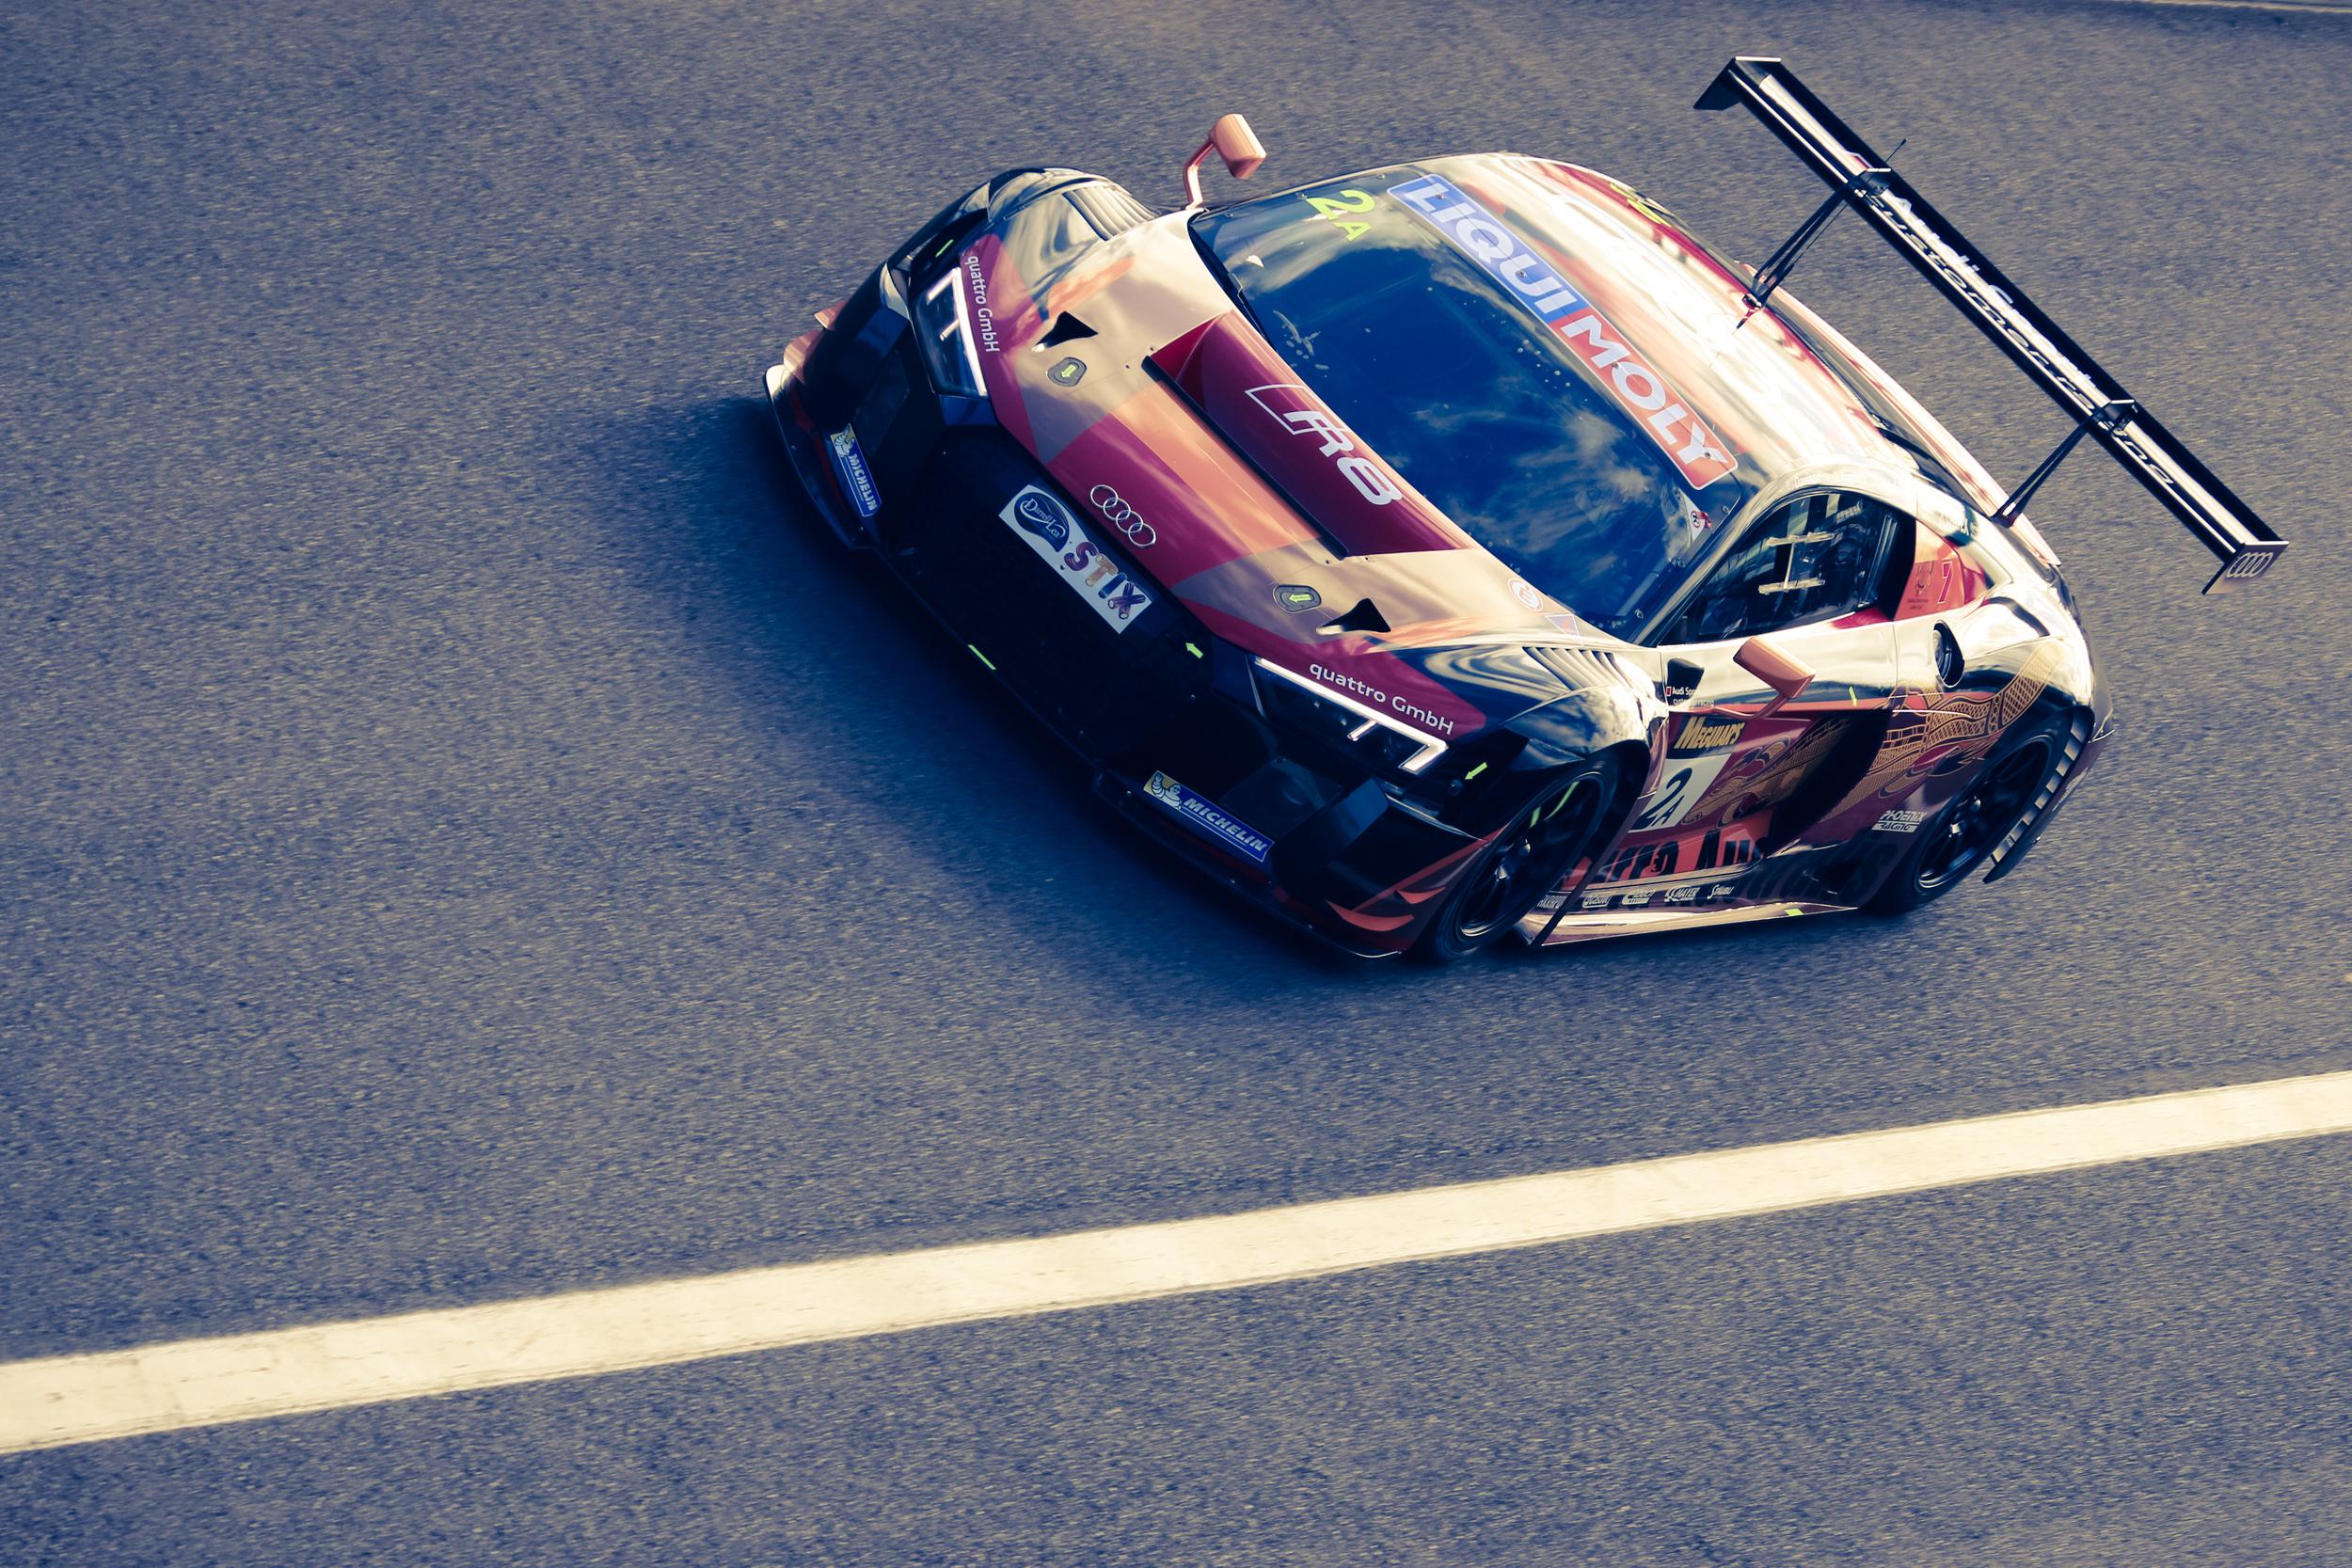 The Phoenix Audi R8 driven by Laurens Vnthoor, Markus Winkelhock, and Will Davison.